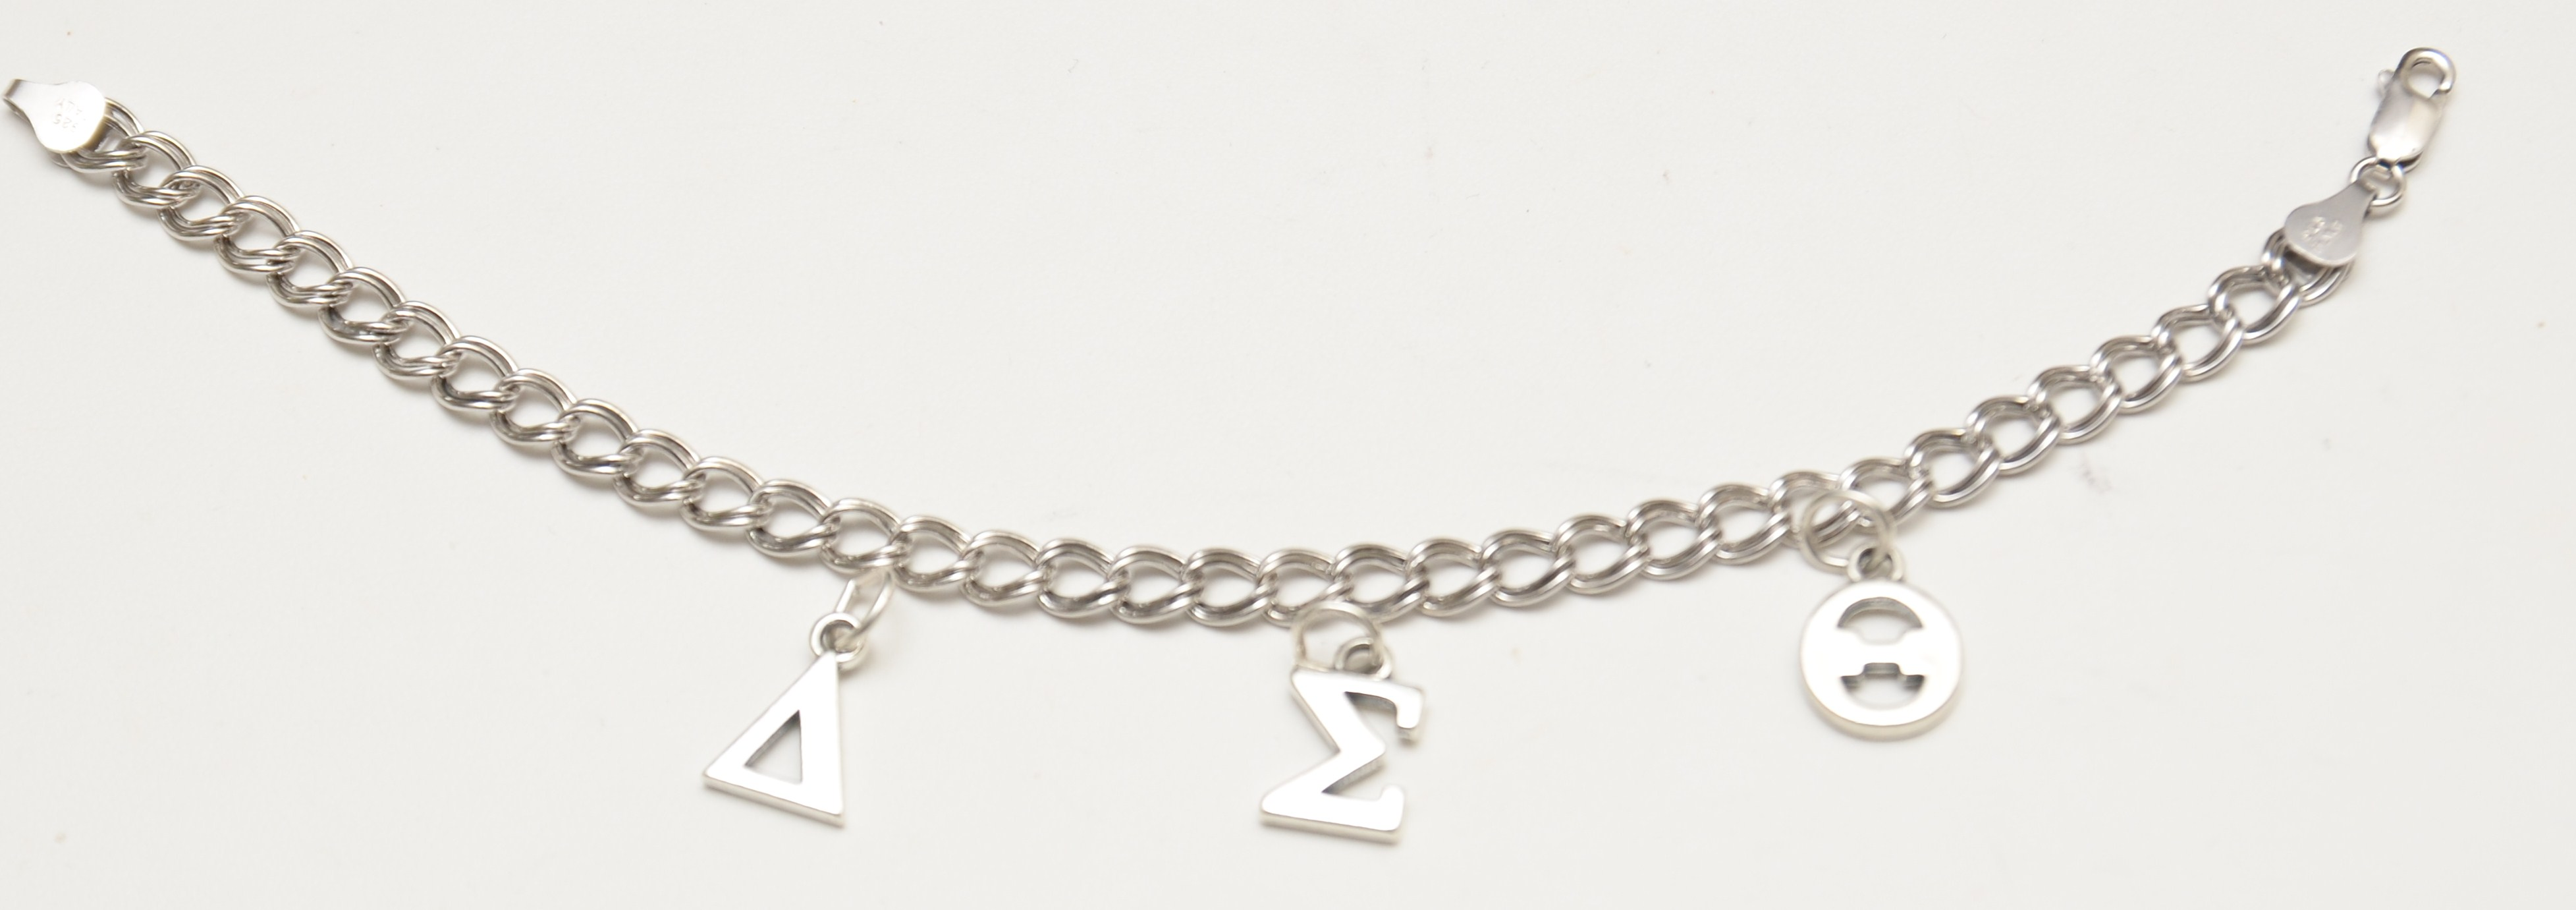 Delta sigma theta sterling silver charm bracelet jlm for Delta sigma theta jewelry